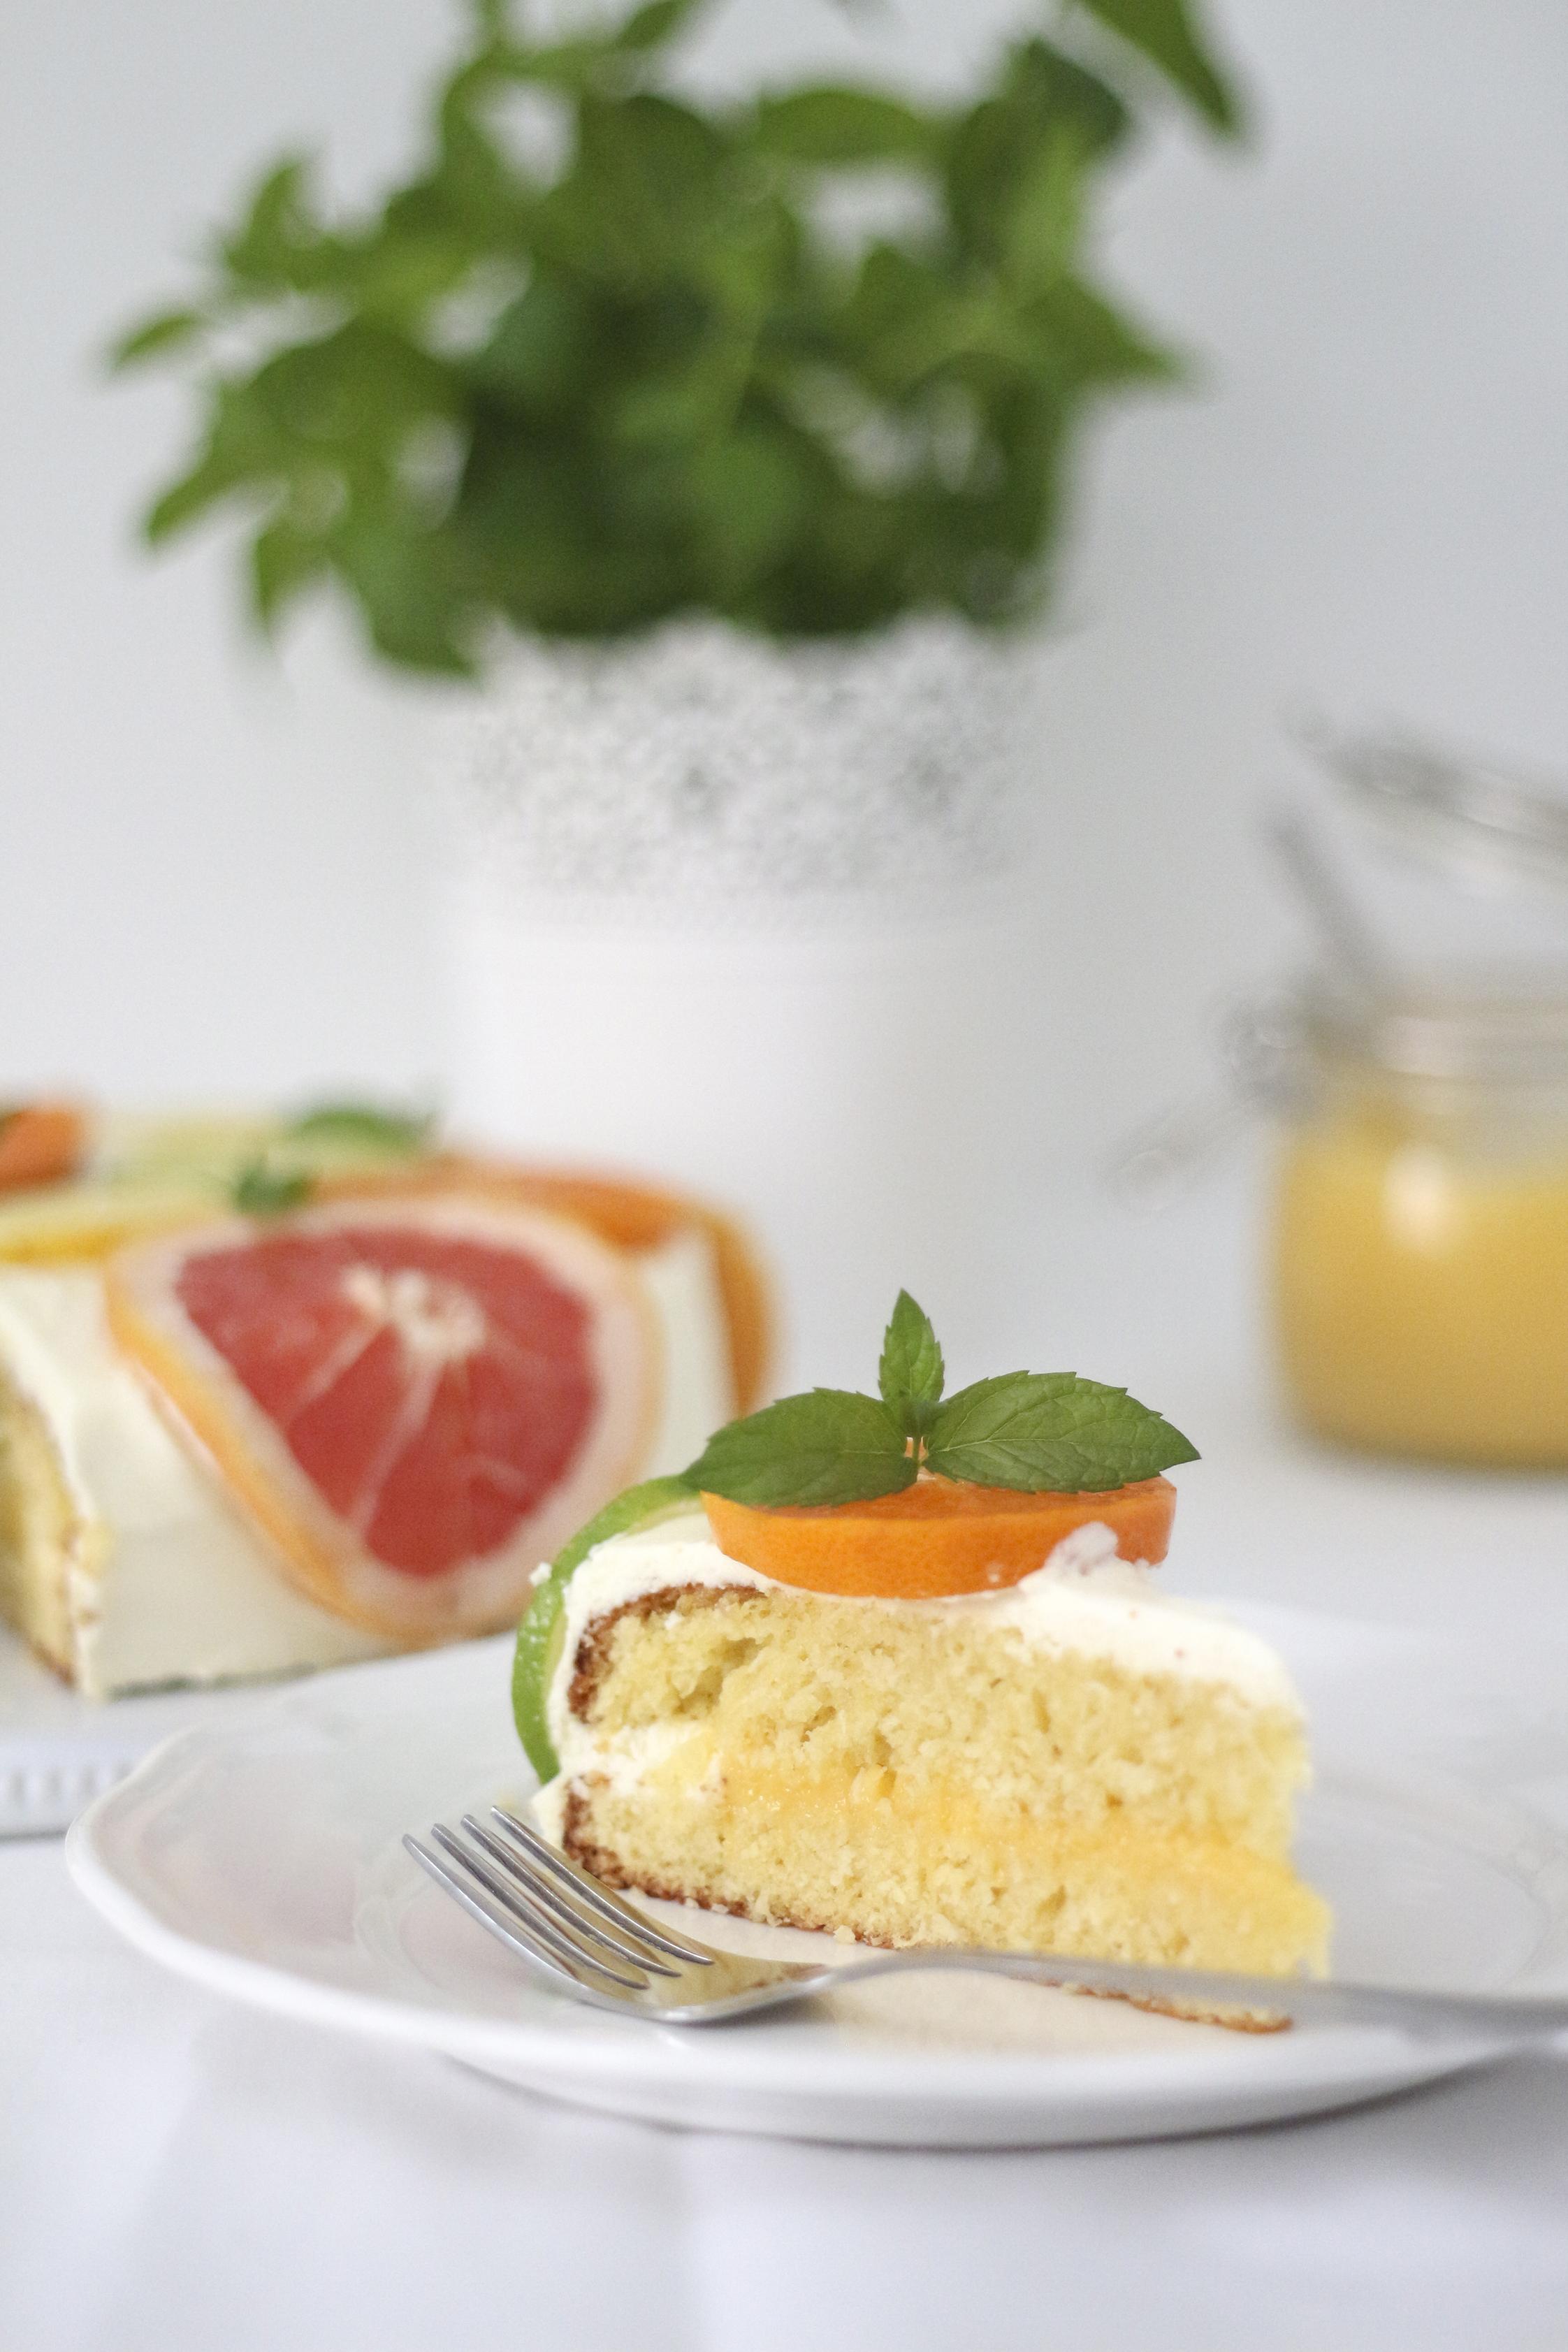 Coconut Cake with Citrus11